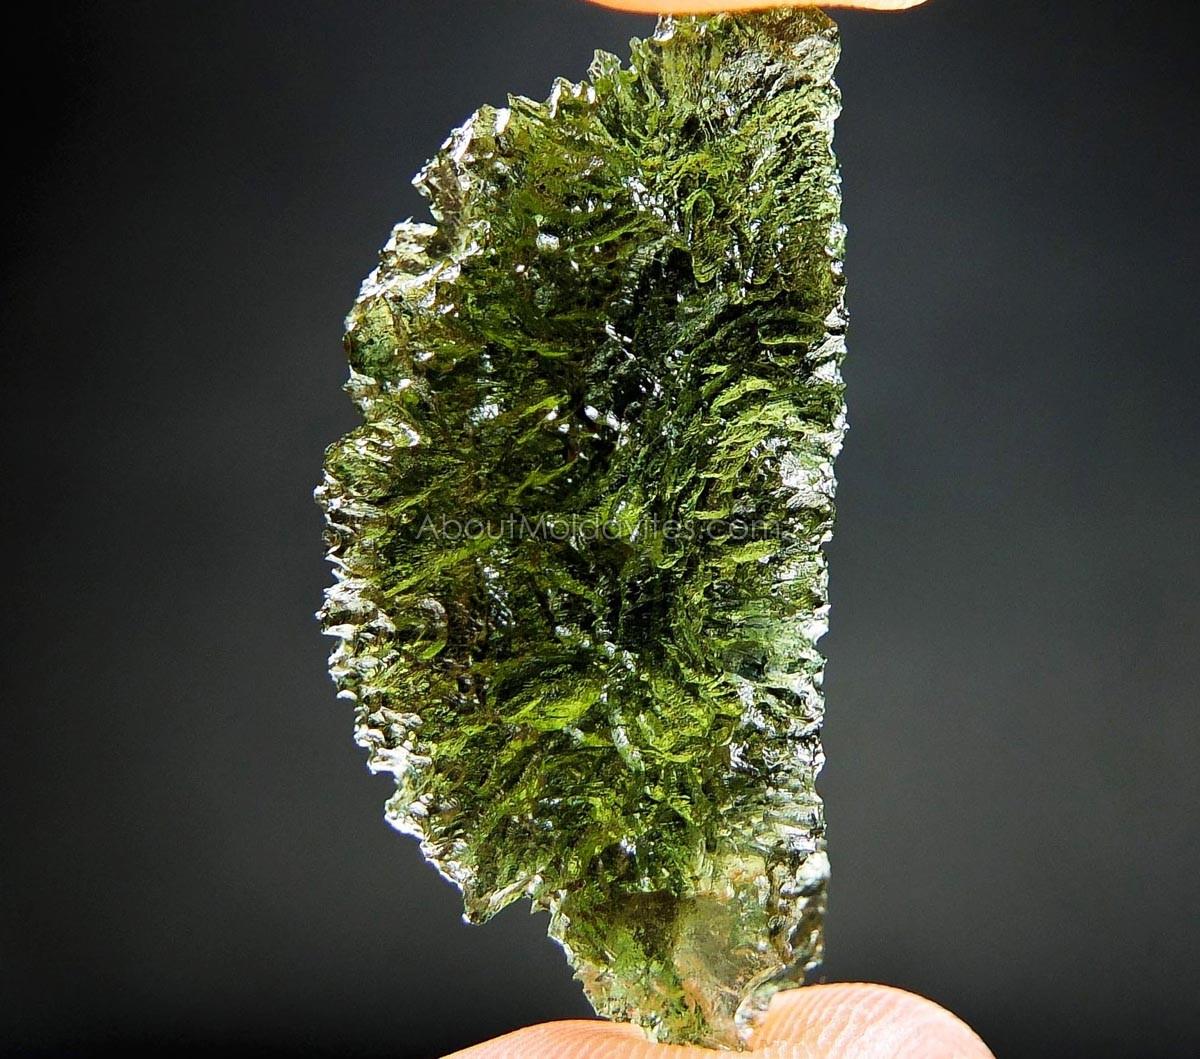 Moldavite from Maly Chlum (like a hedgehog)